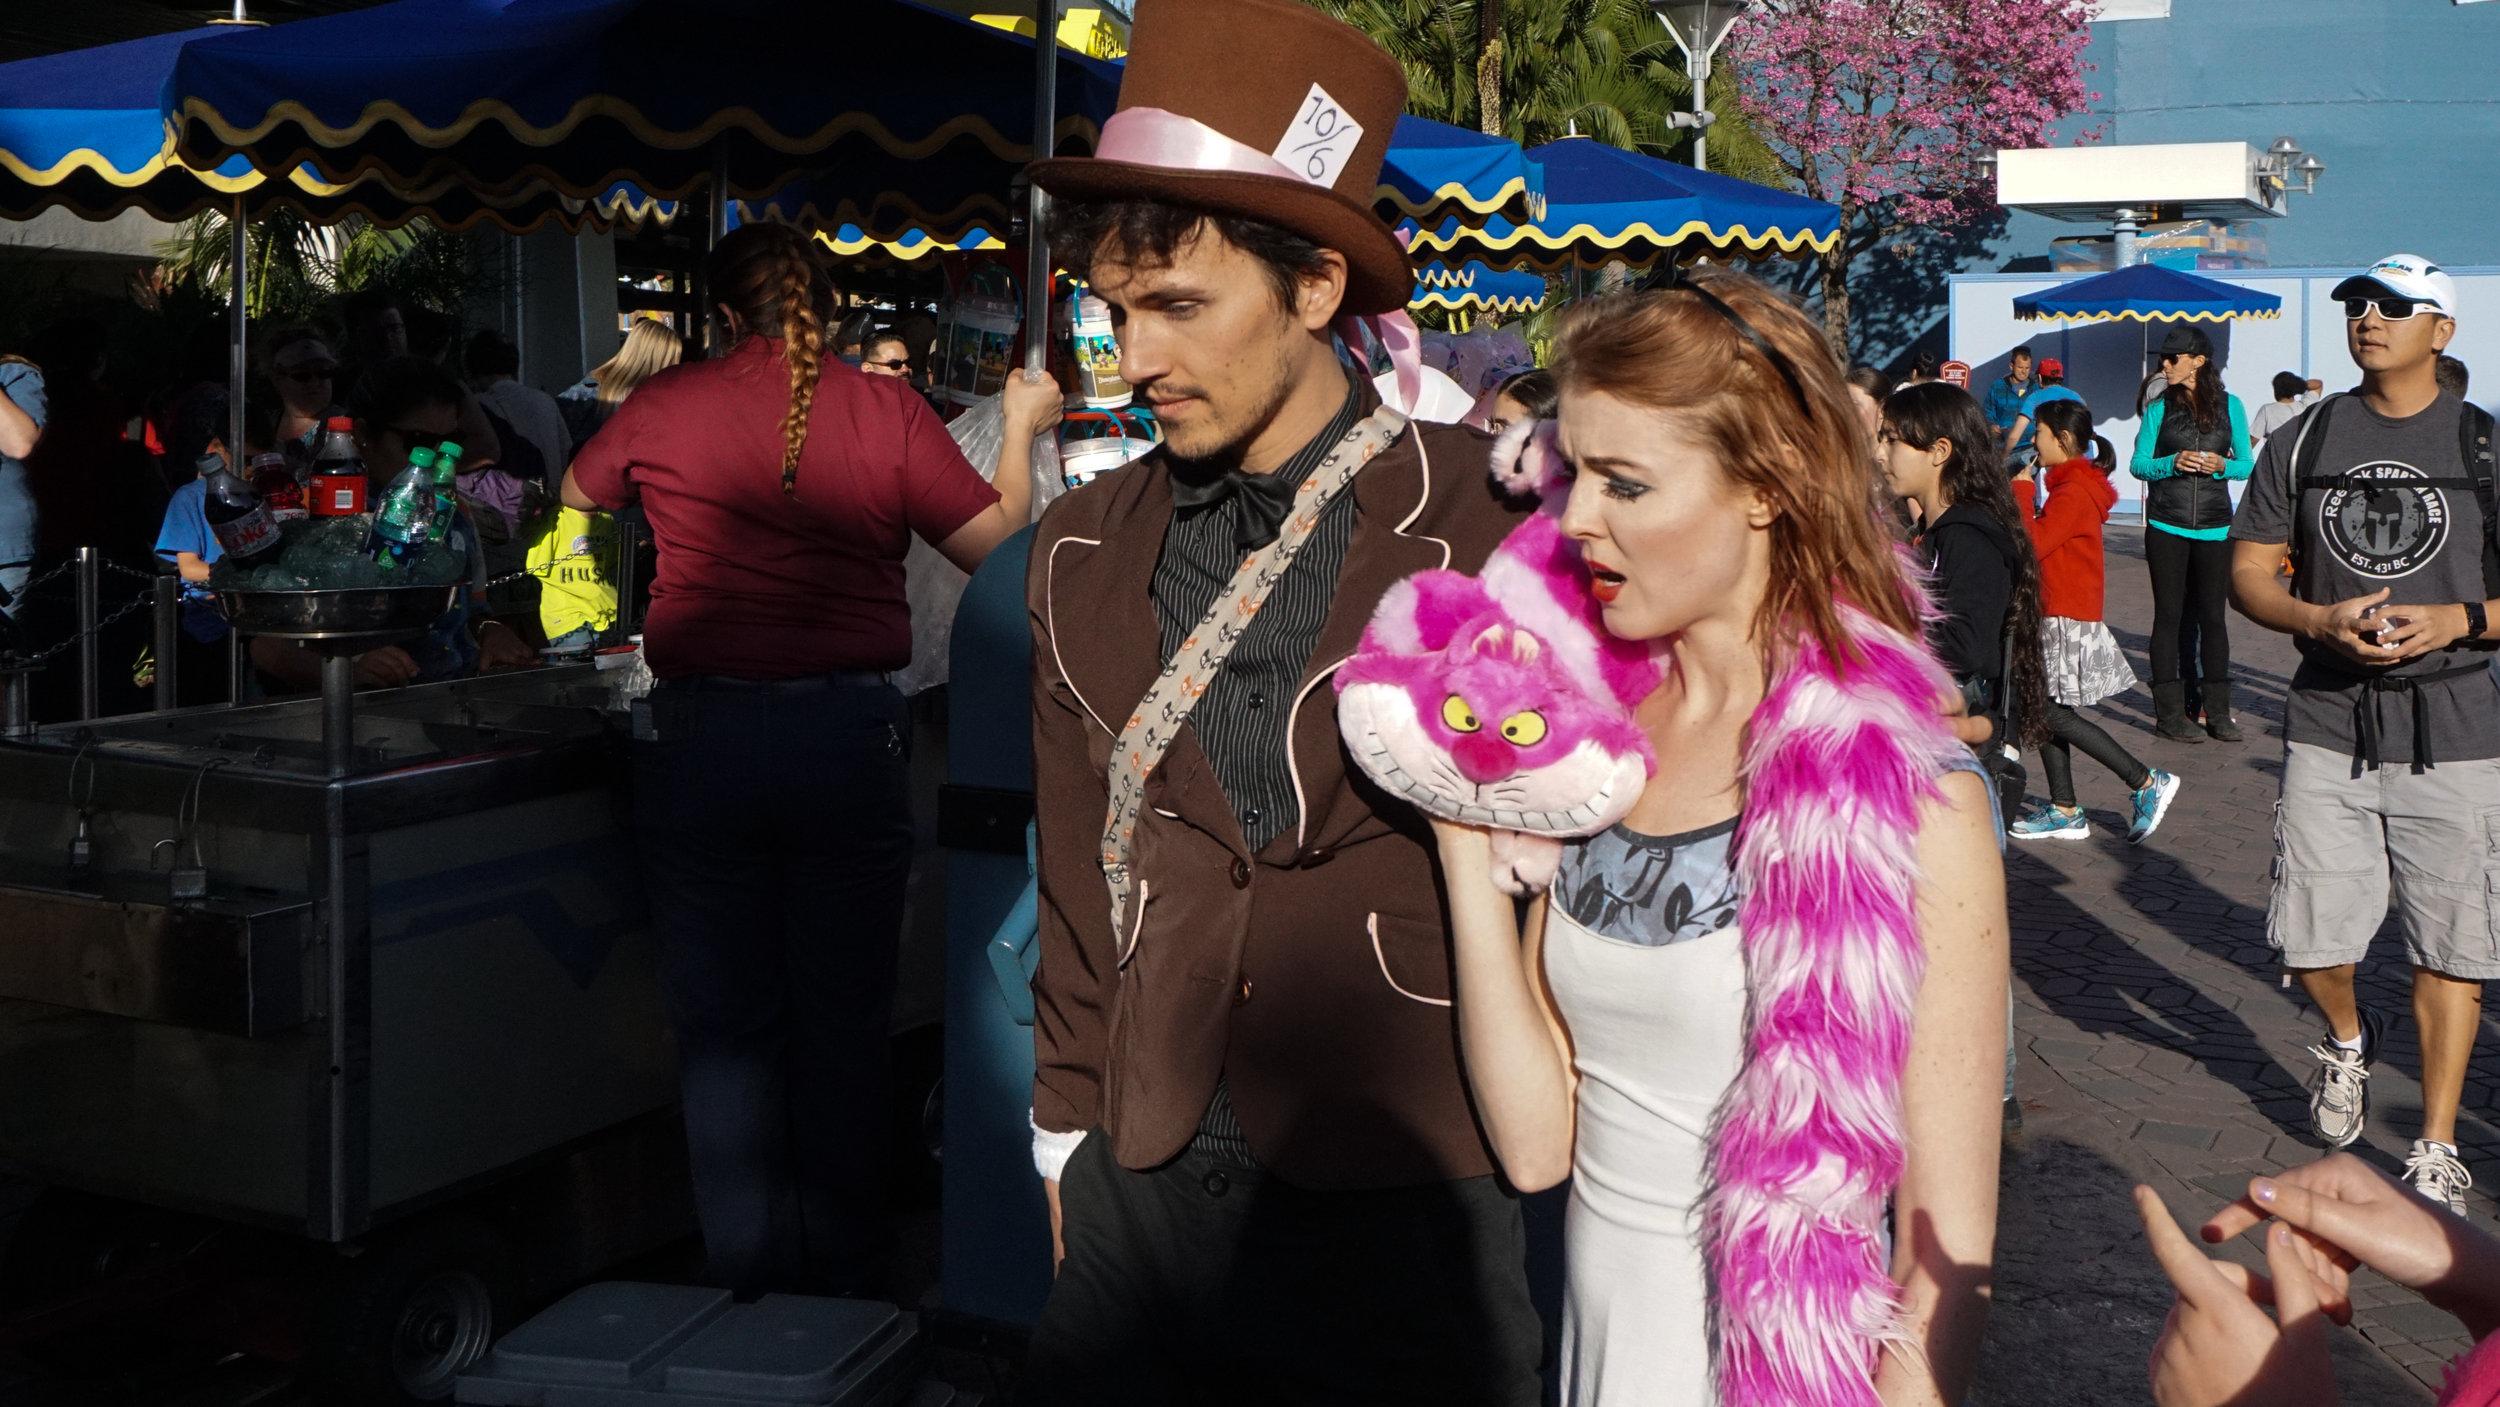 Disney-Mad-Hatter-1b-04014.jpg